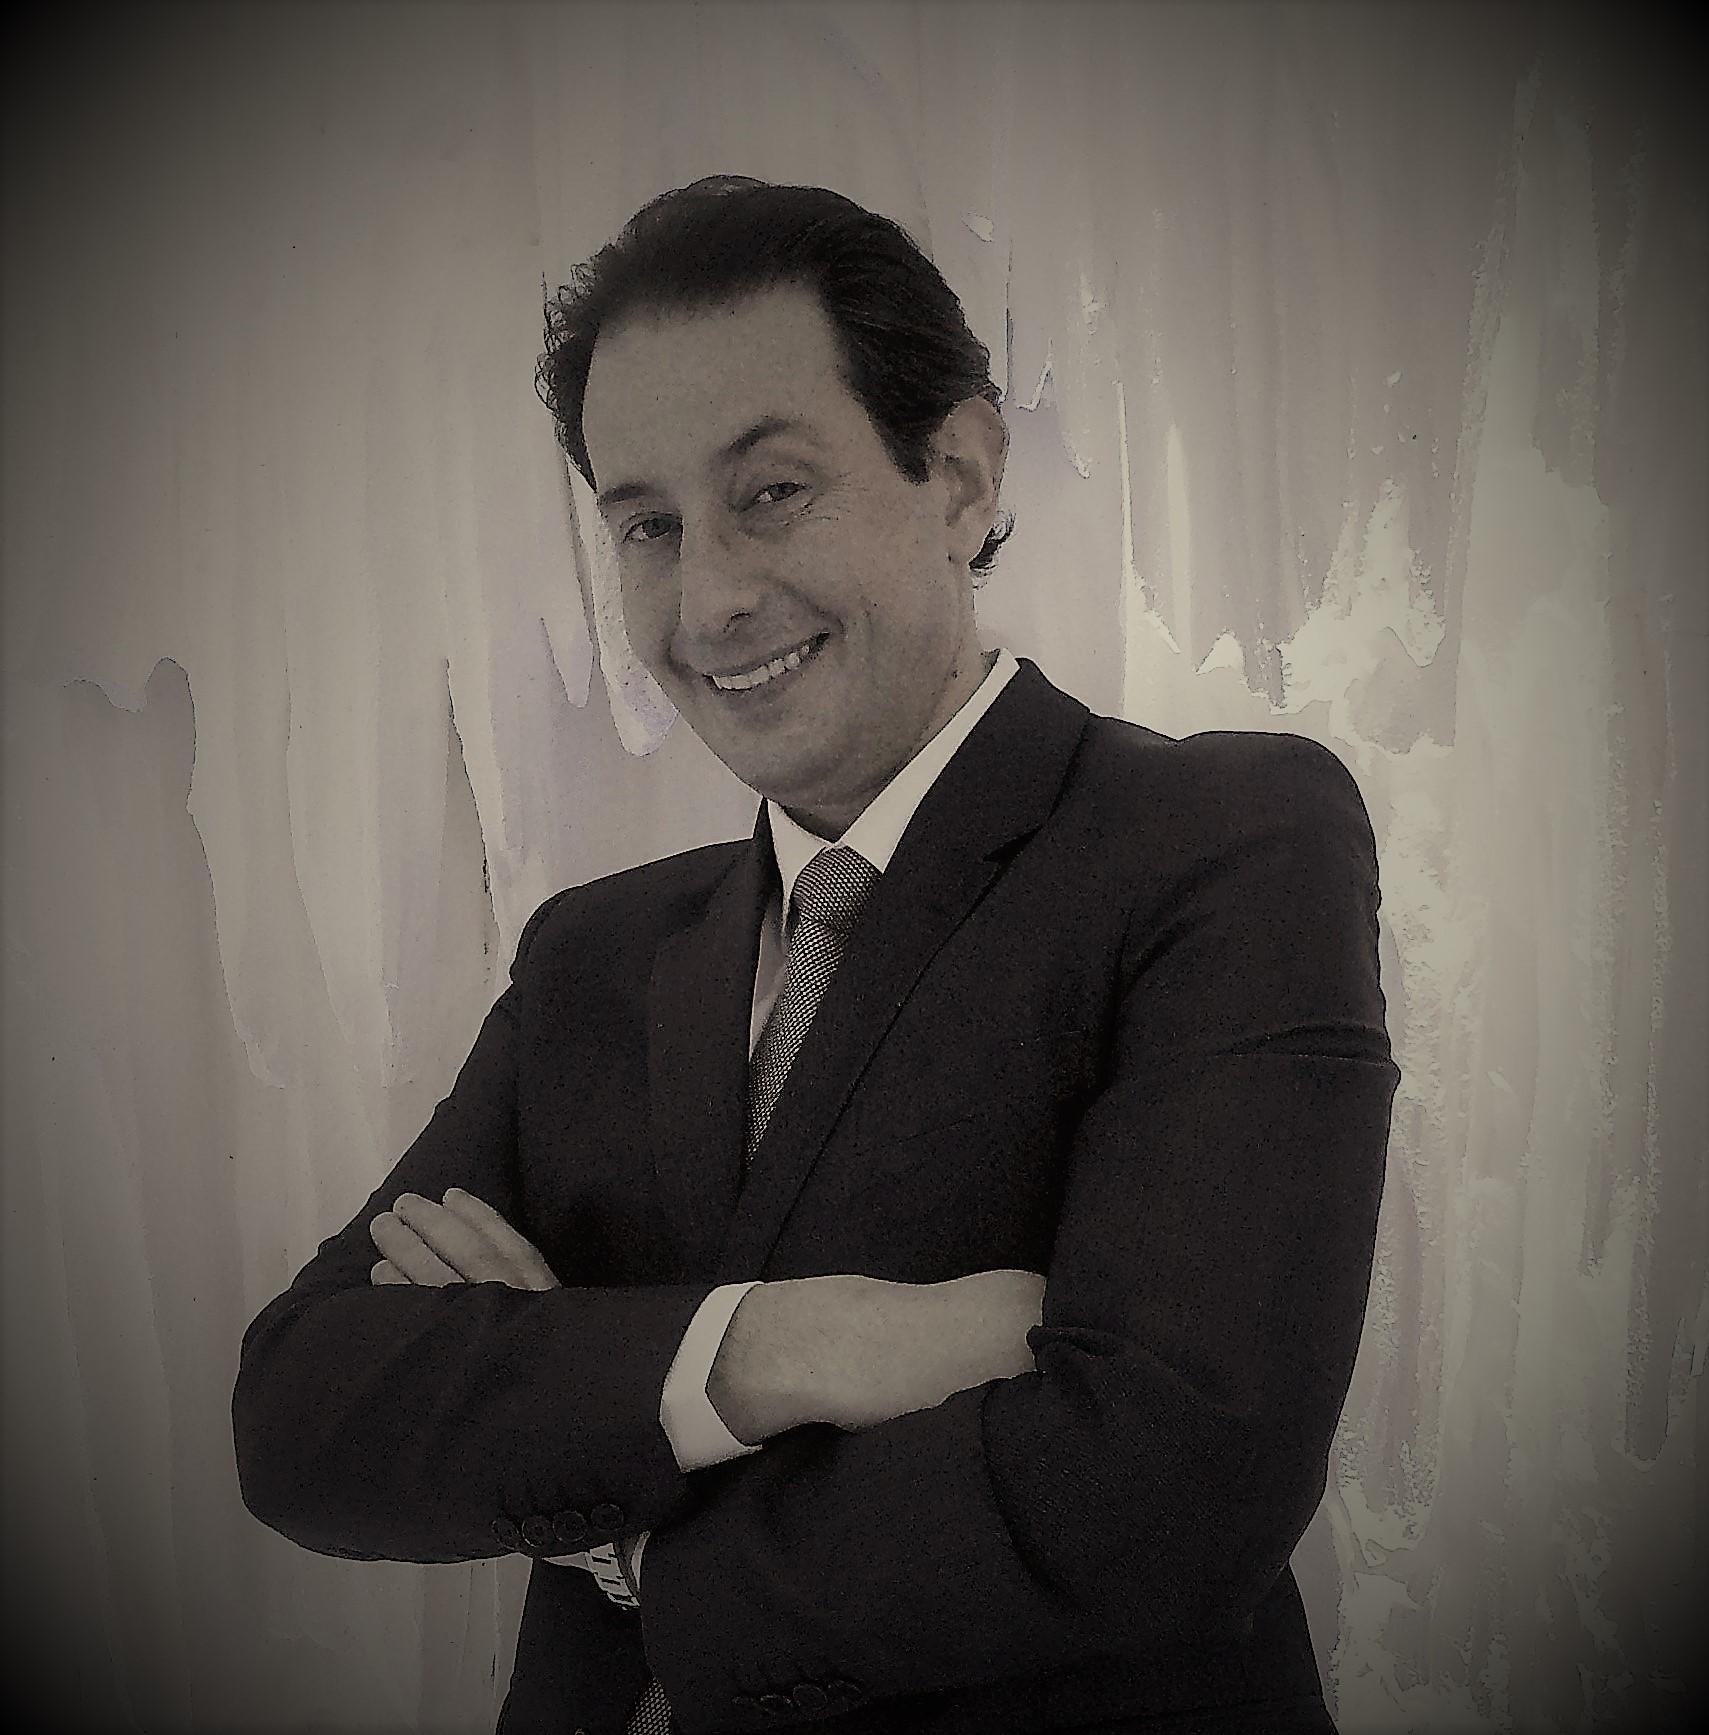 Olivier Fournier-Laroque